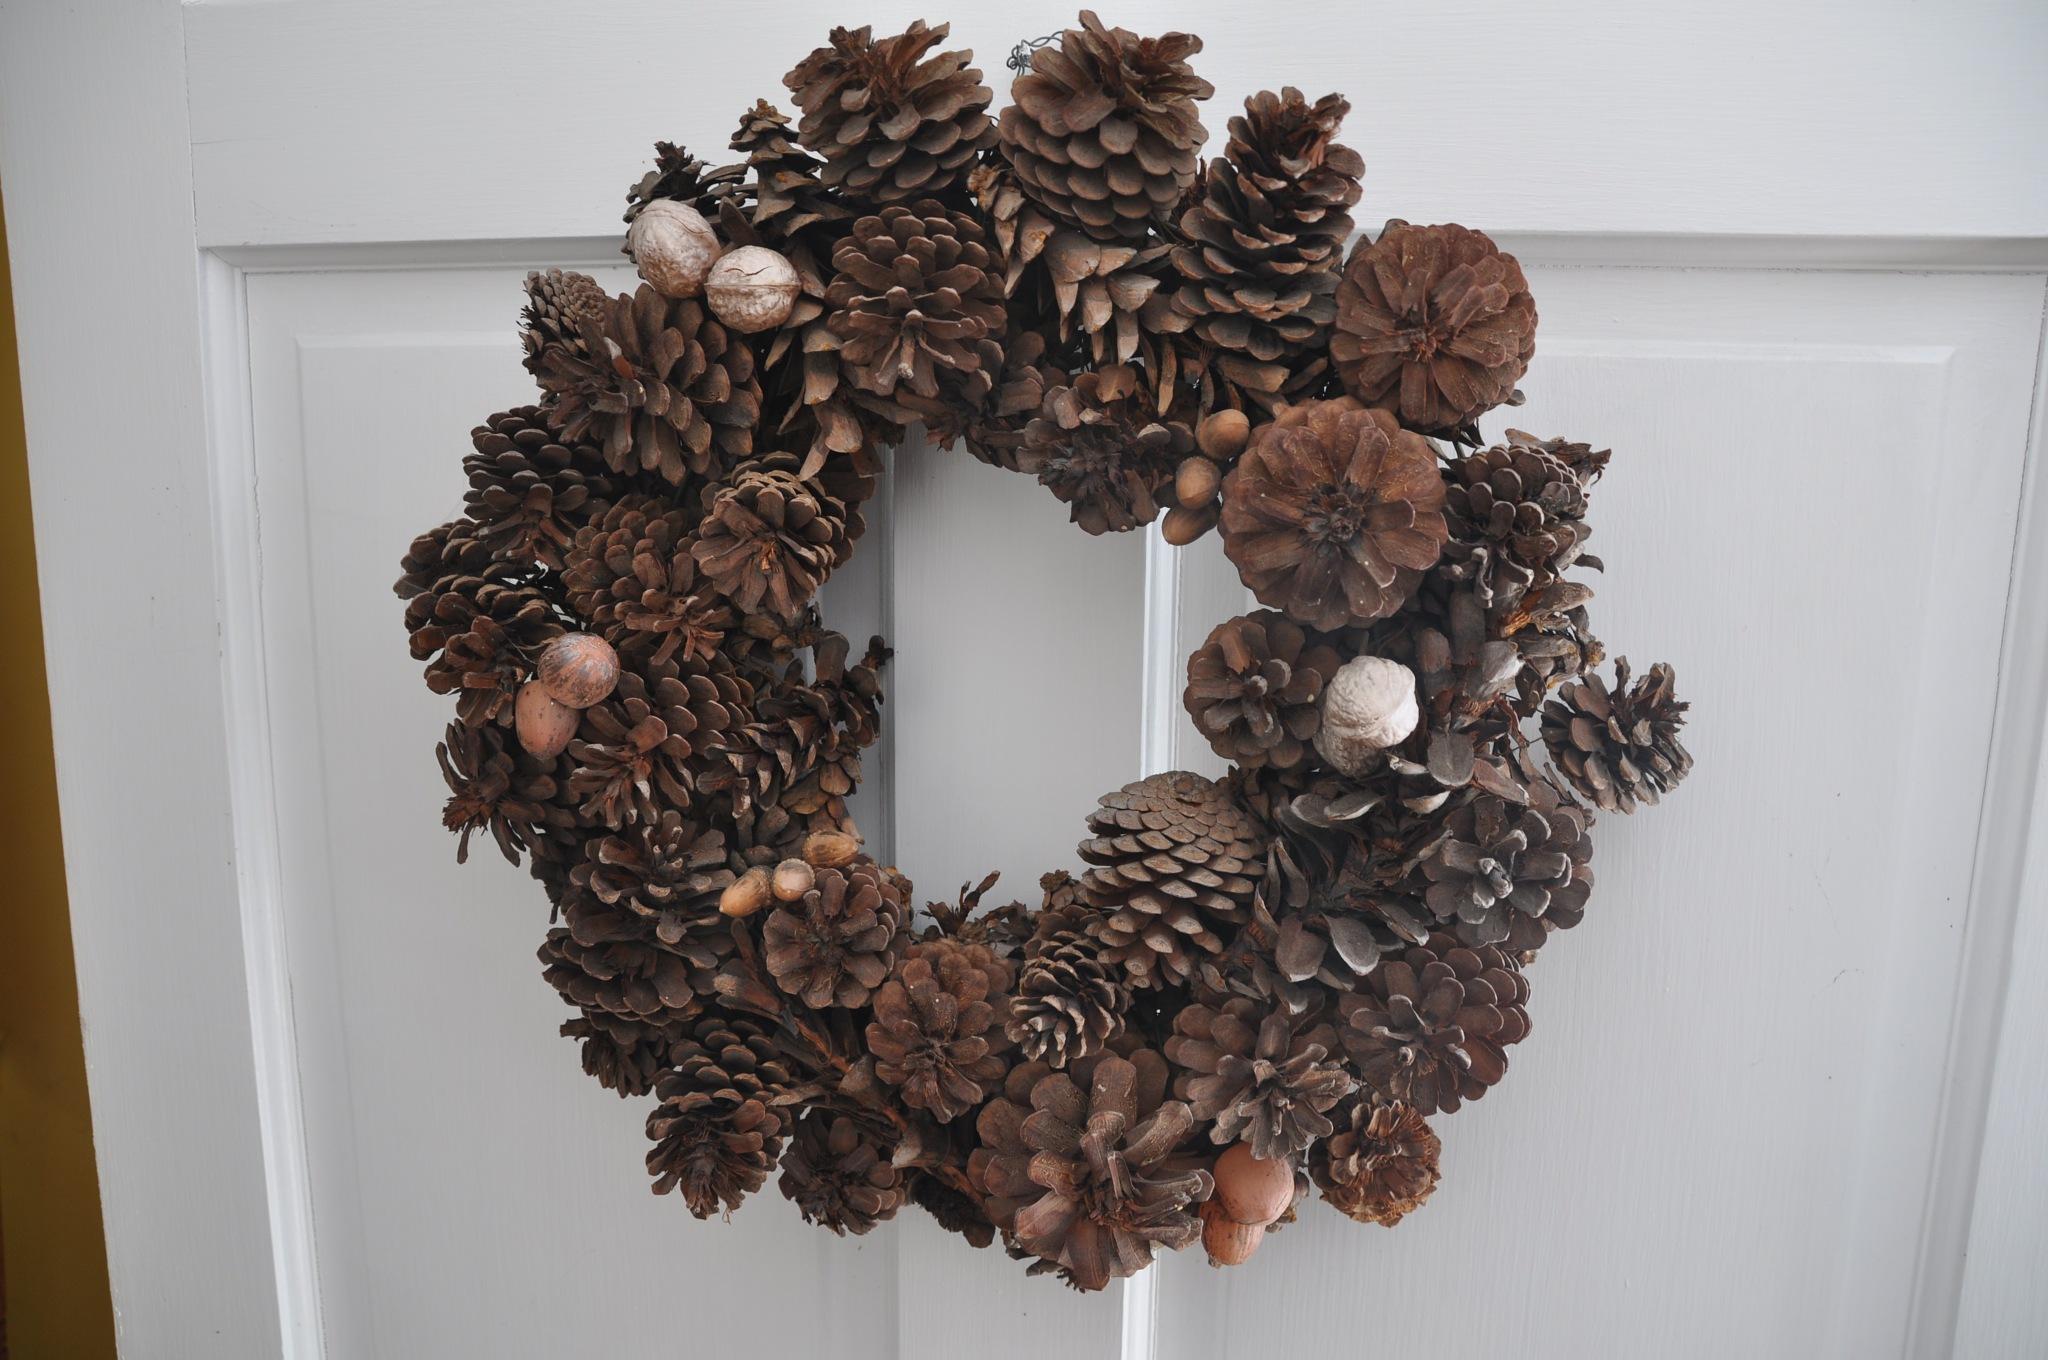 Dad's  Holiday  Wreath  ~ North Street ~  Walpole, MA ~   over   20 years  old  ~ Feb. 14, 2017 by domenic.silvi